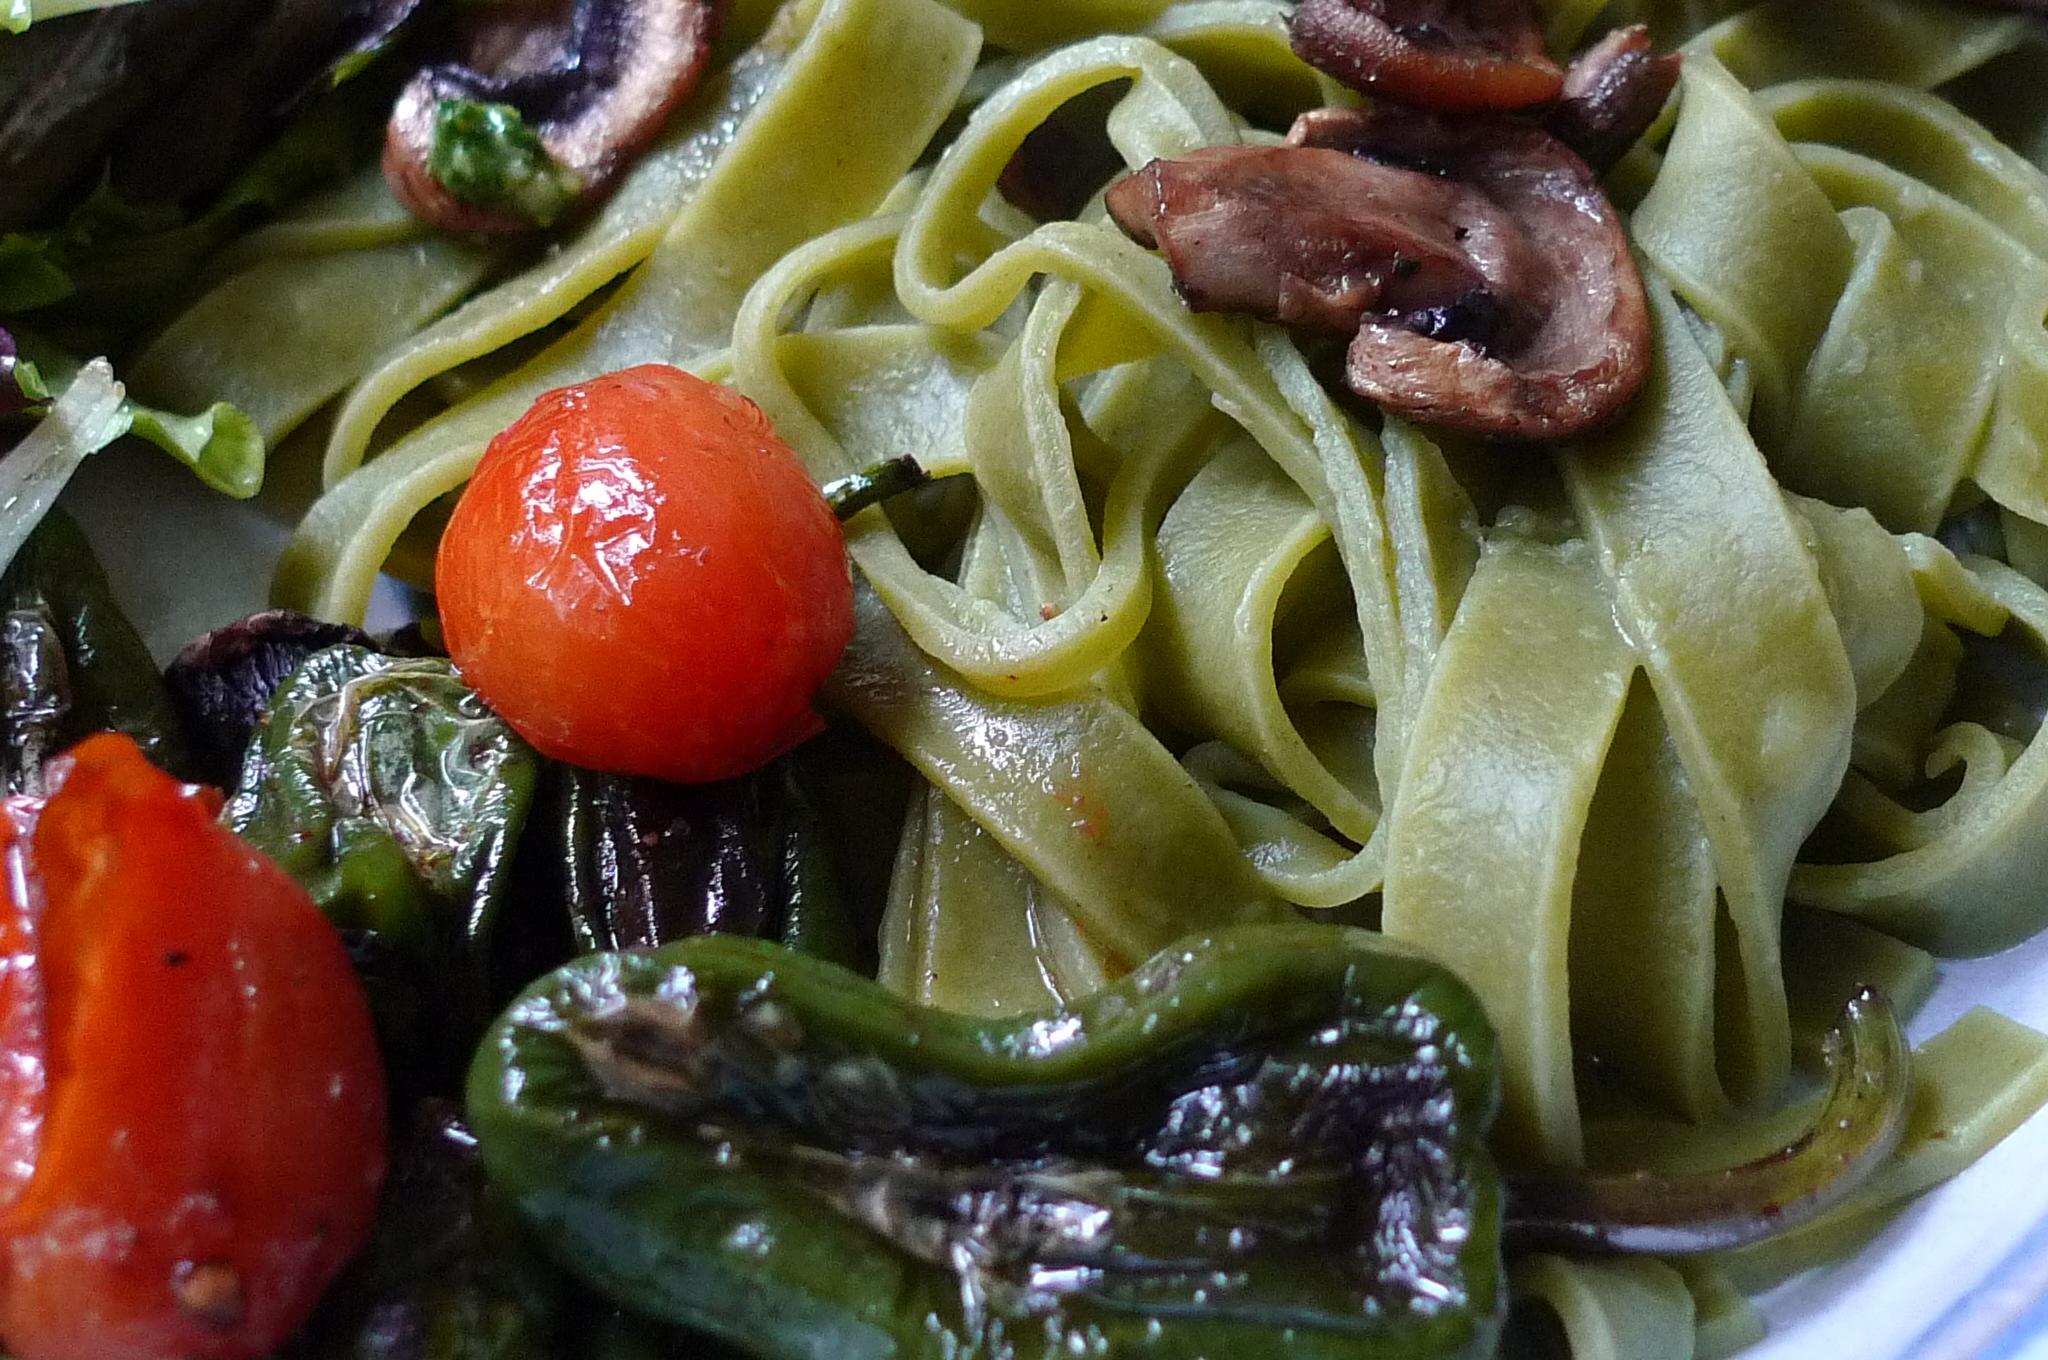 Grüne Nudeln,Ruccolapesto,Pilze,Bratpaprika,Salat-8.3.15   (12)